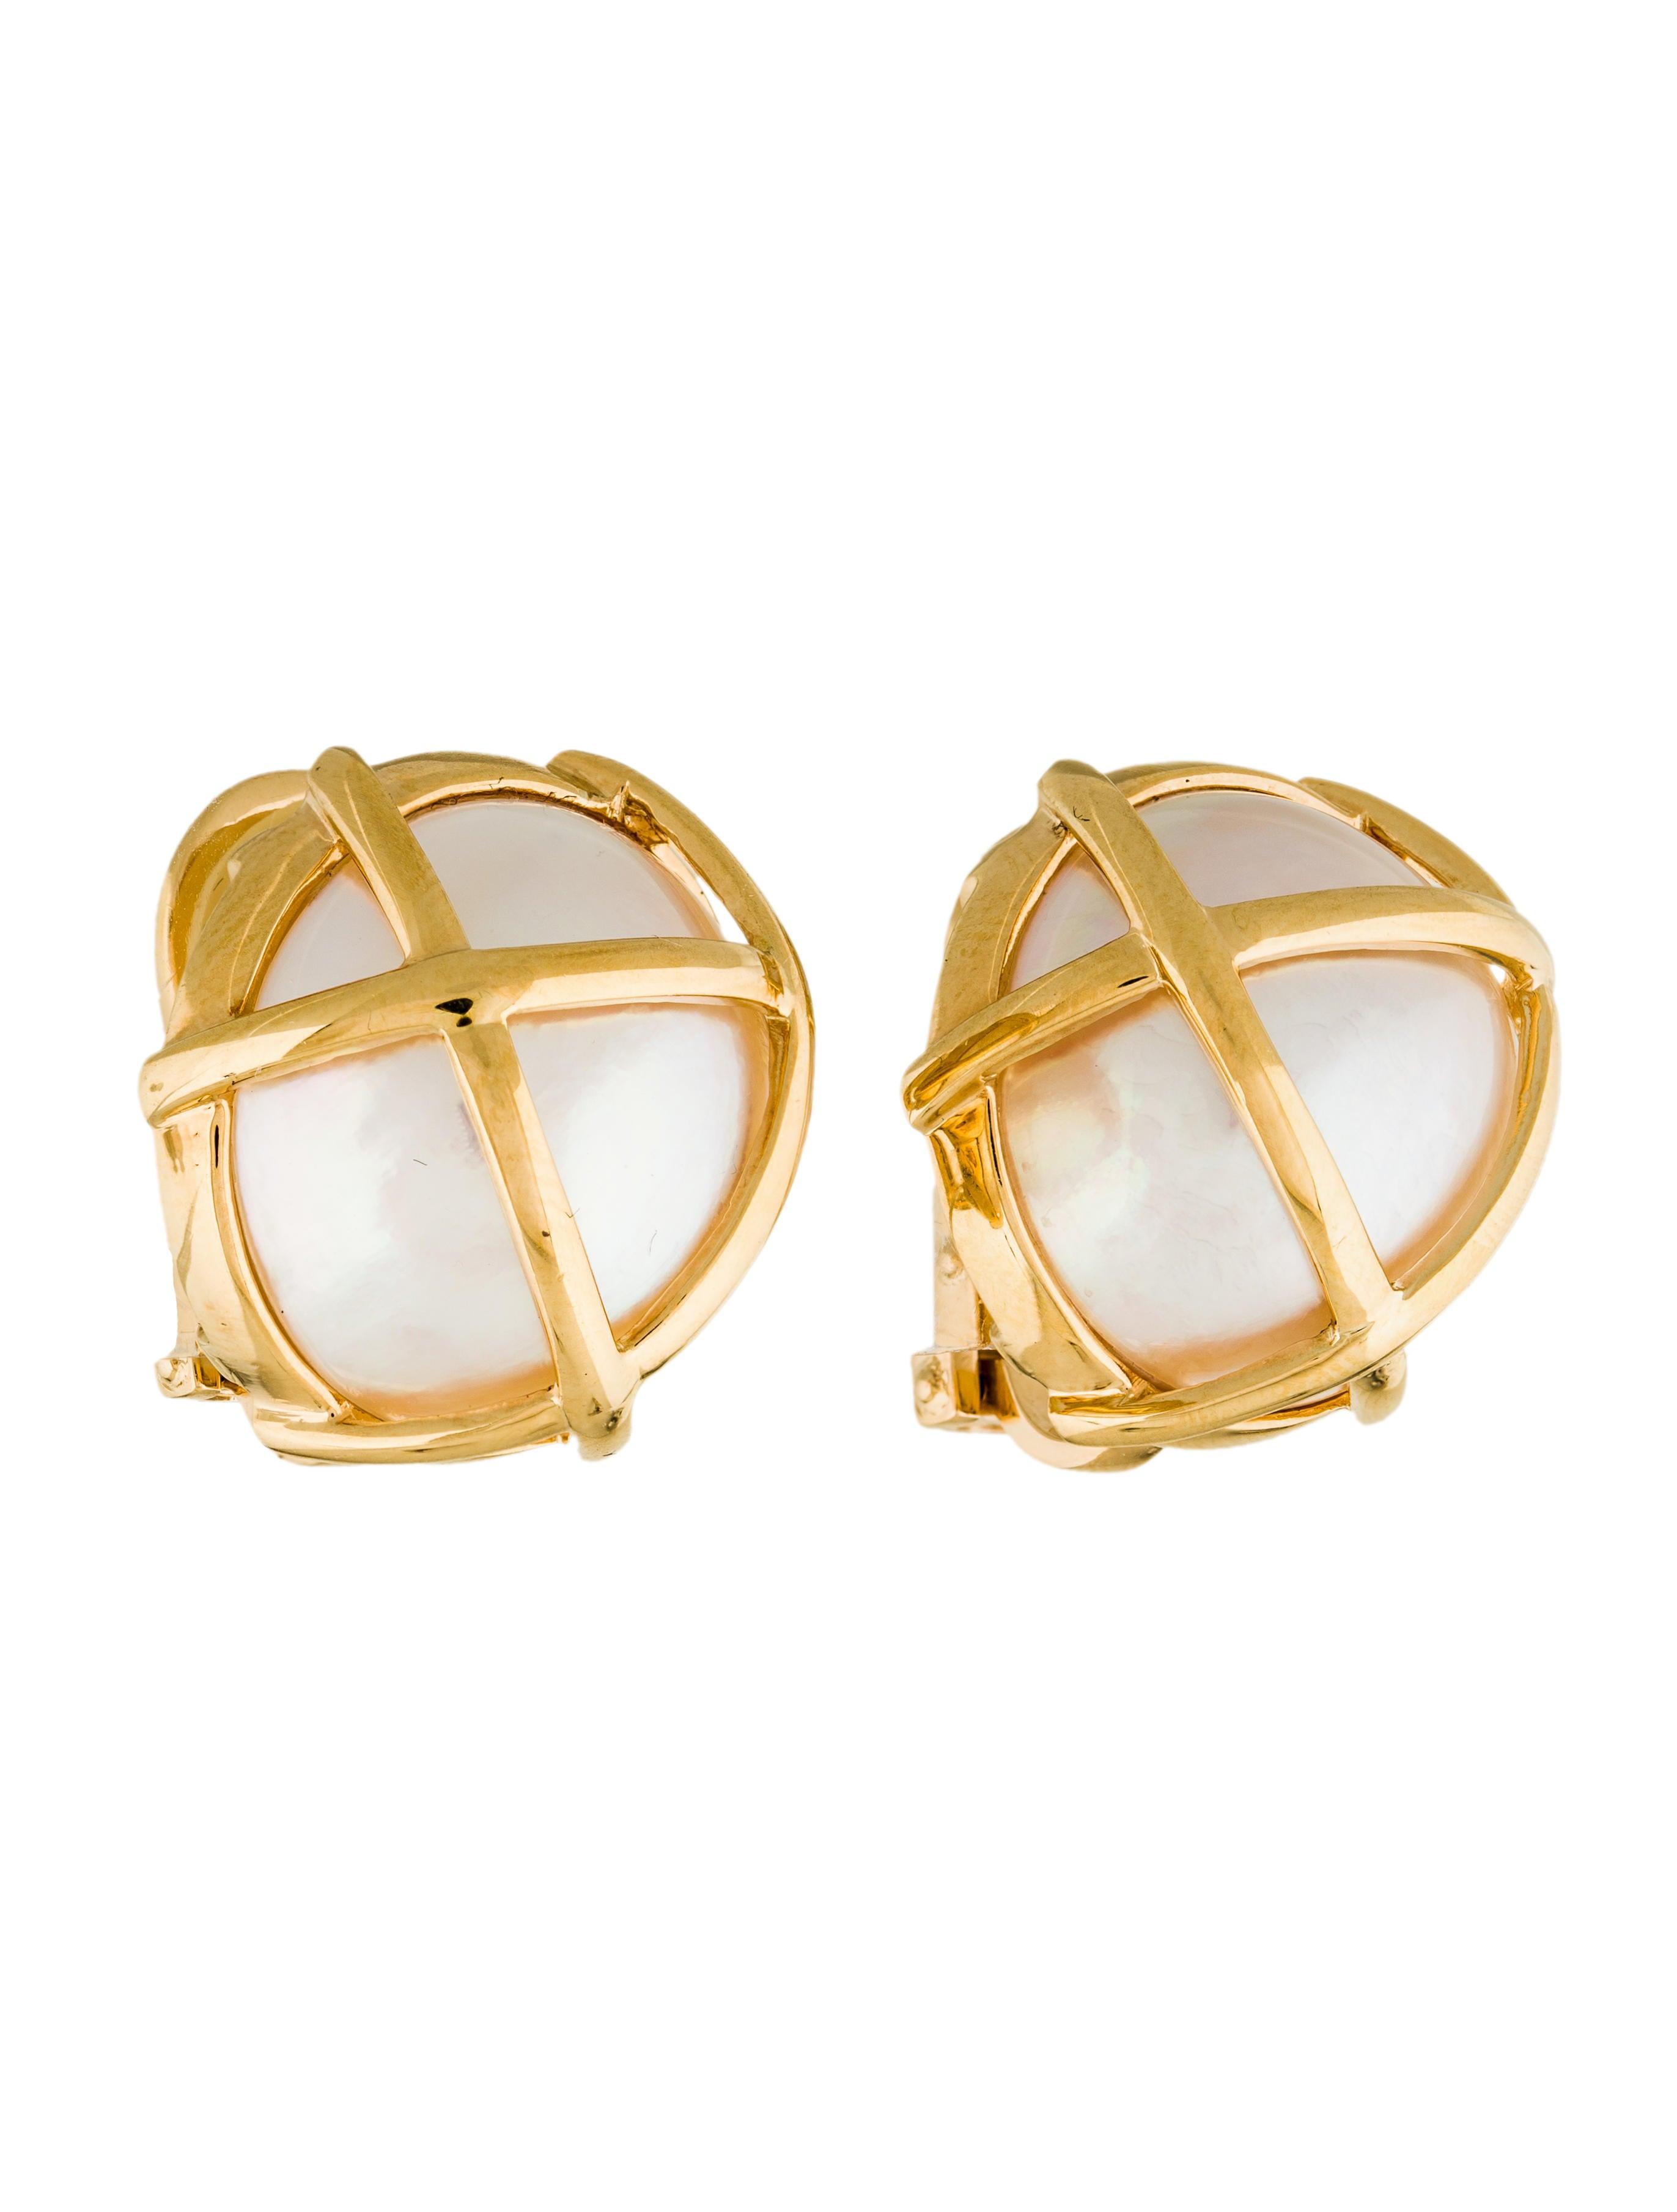 verdura 18k mab pearl caged clip on earrings earrings. Black Bedroom Furniture Sets. Home Design Ideas